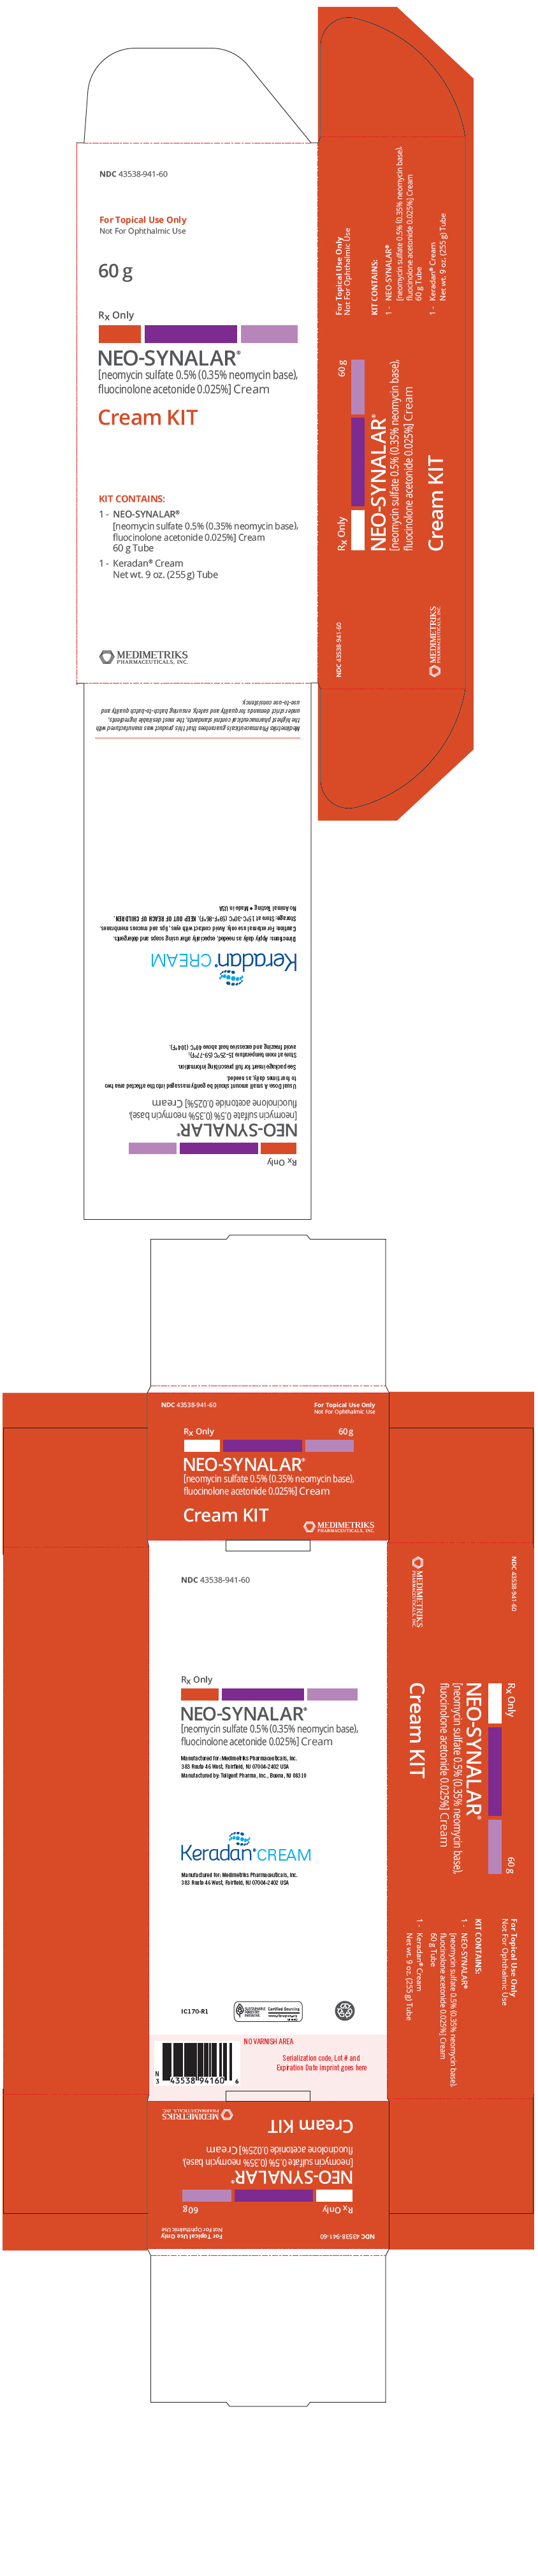 Neo-synalar (Neomycin Sulfate And Fluocinolone Acetonide) Kit [Medimetriks Pharmaceuticals]